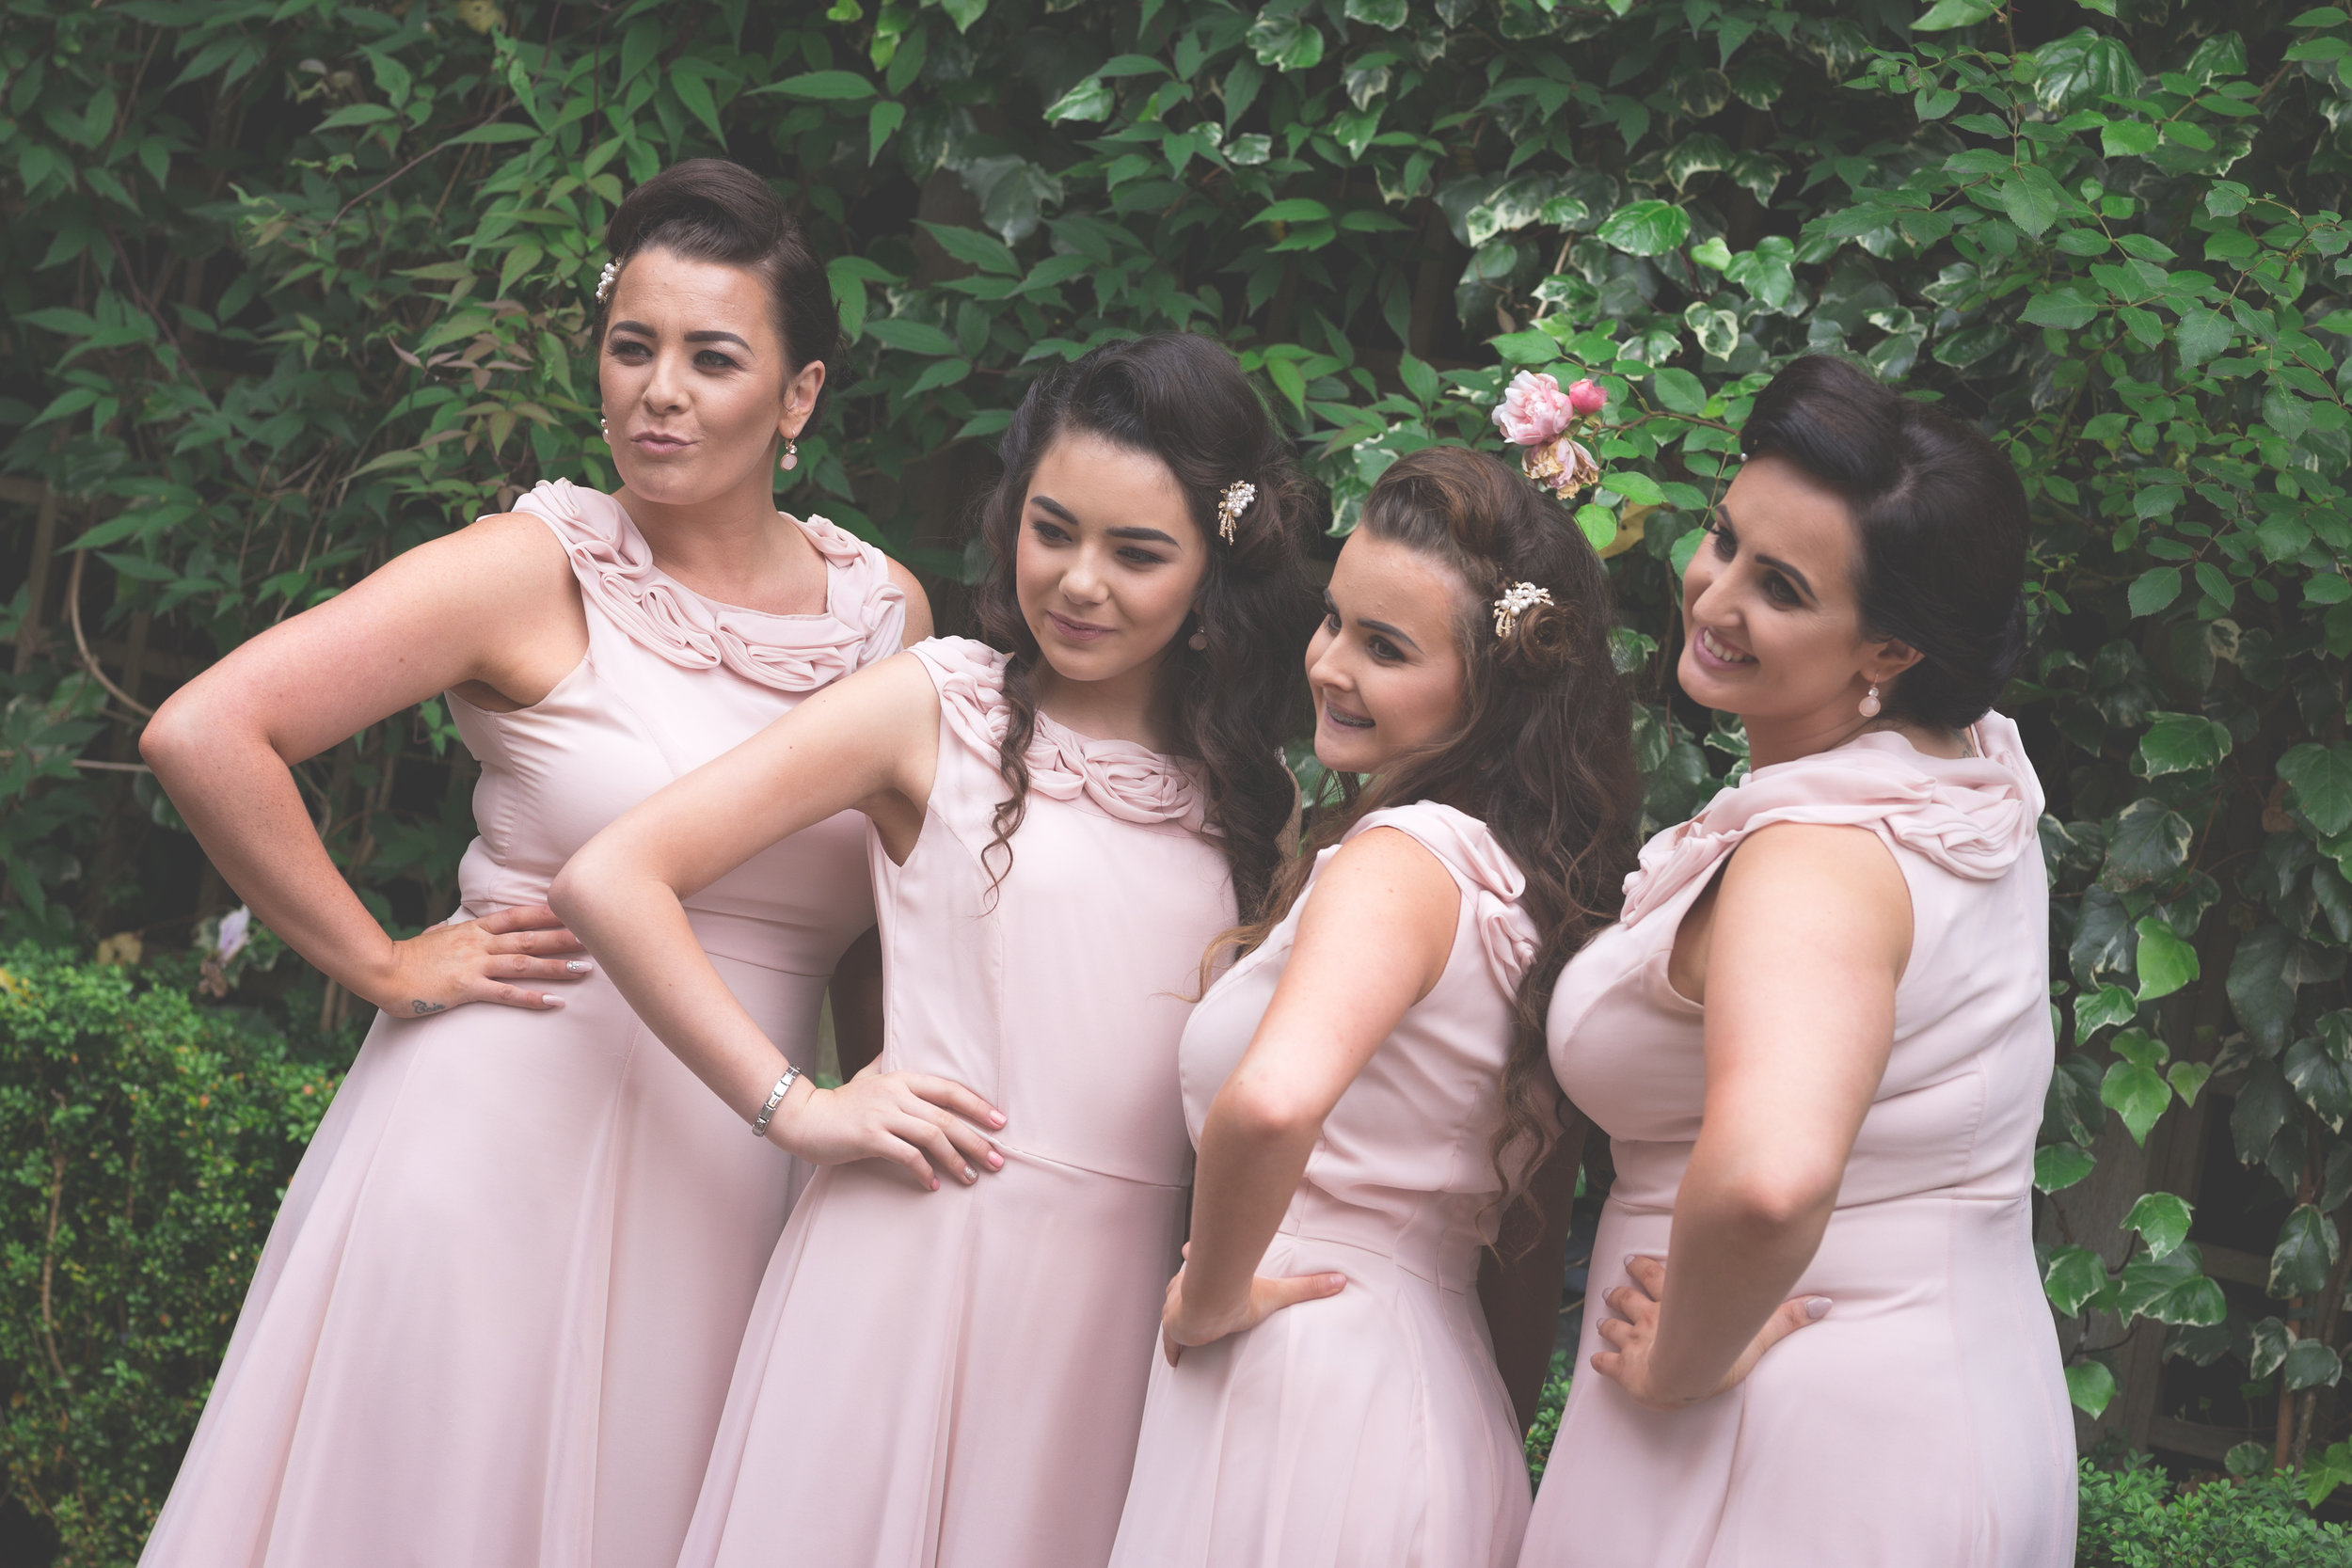 Antoinette & Stephen - Portraits | Brian McEwan Photography | Wedding Photographer Northern Ireland 68.jpg